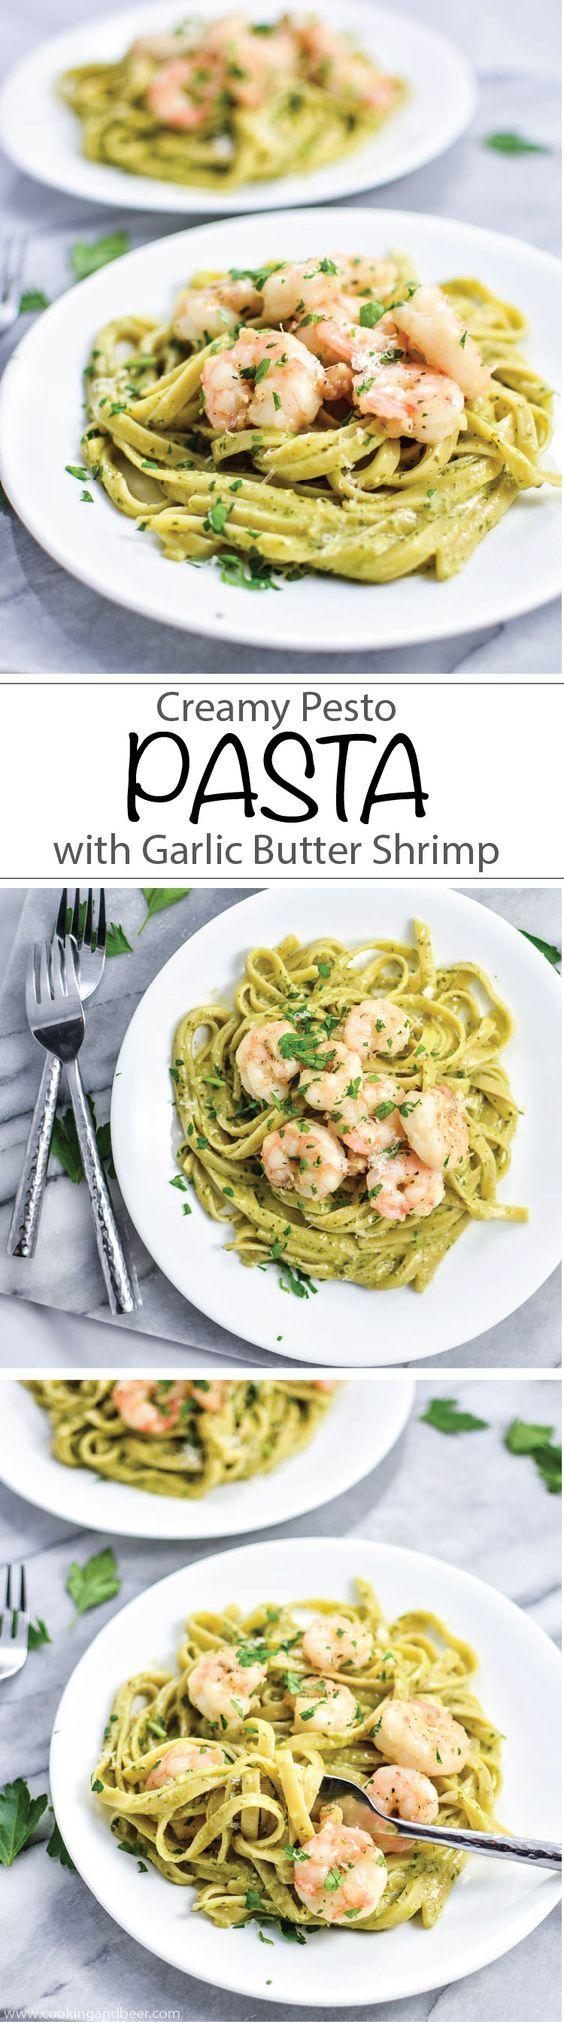 Creamy Pesto Pasta with Garlic Butter Shrimp | www.cookingandbeer.com